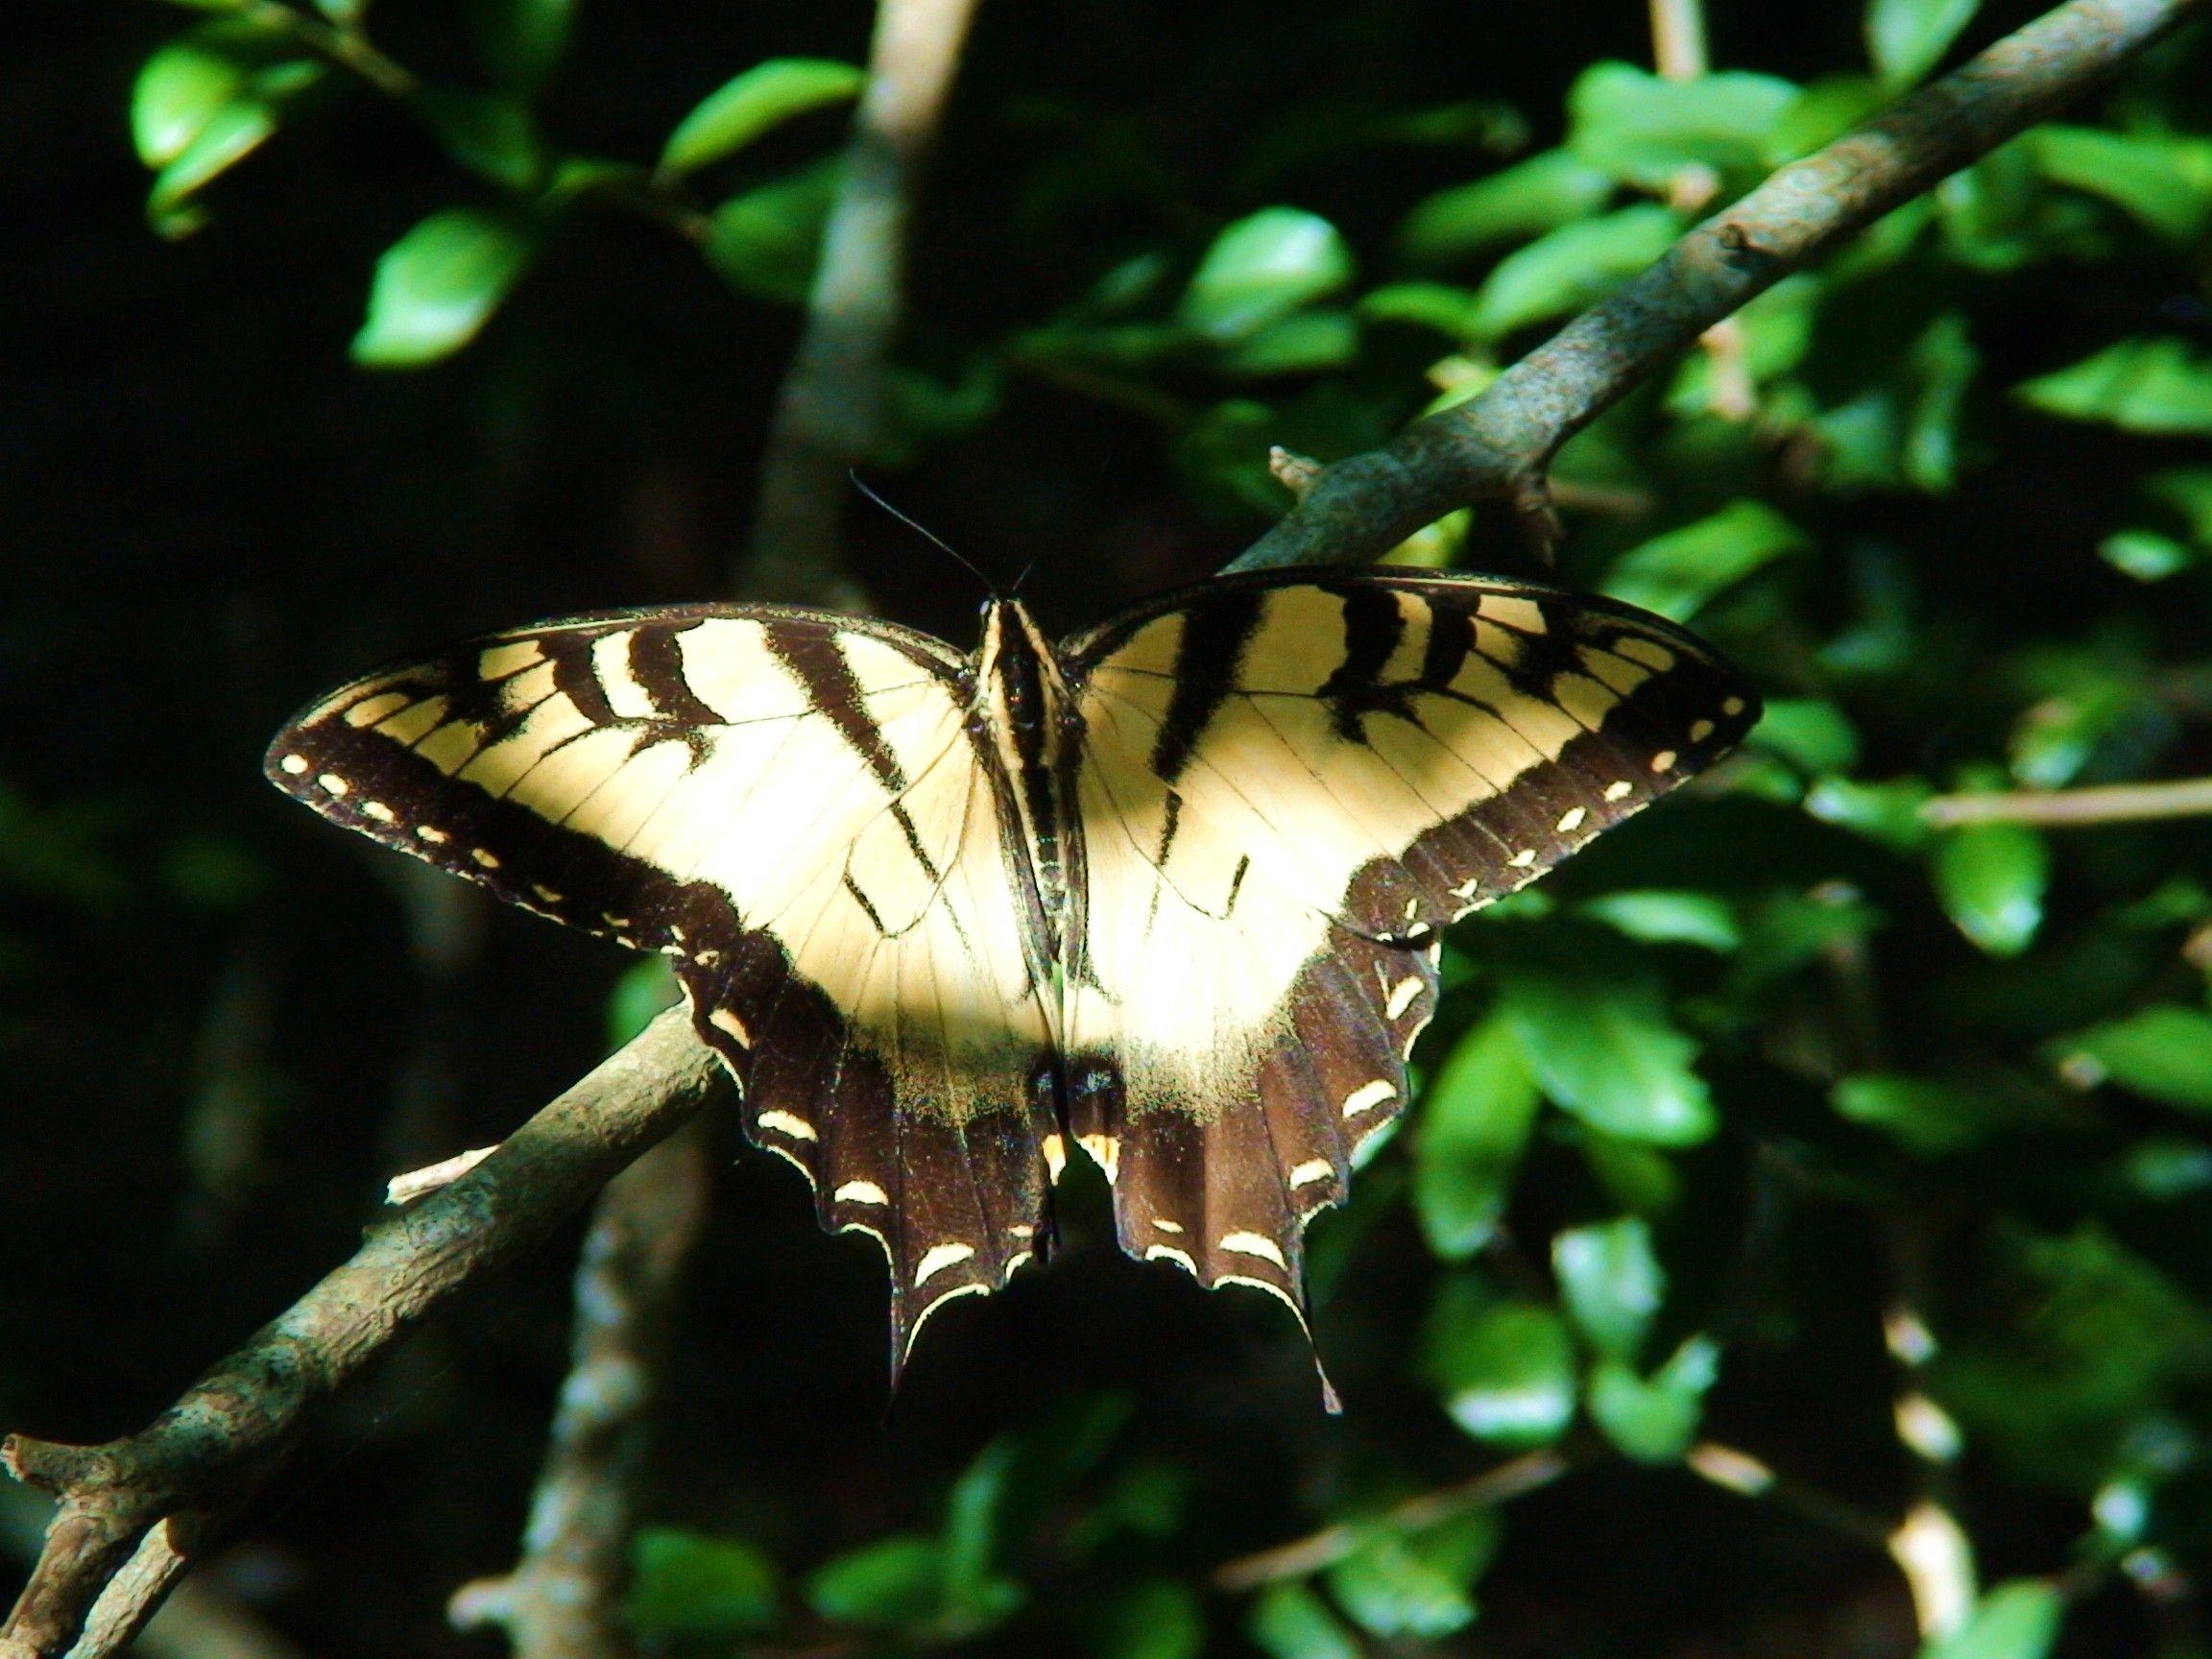 Metamorphosis, A Caterpillar's Life Butterfly pose